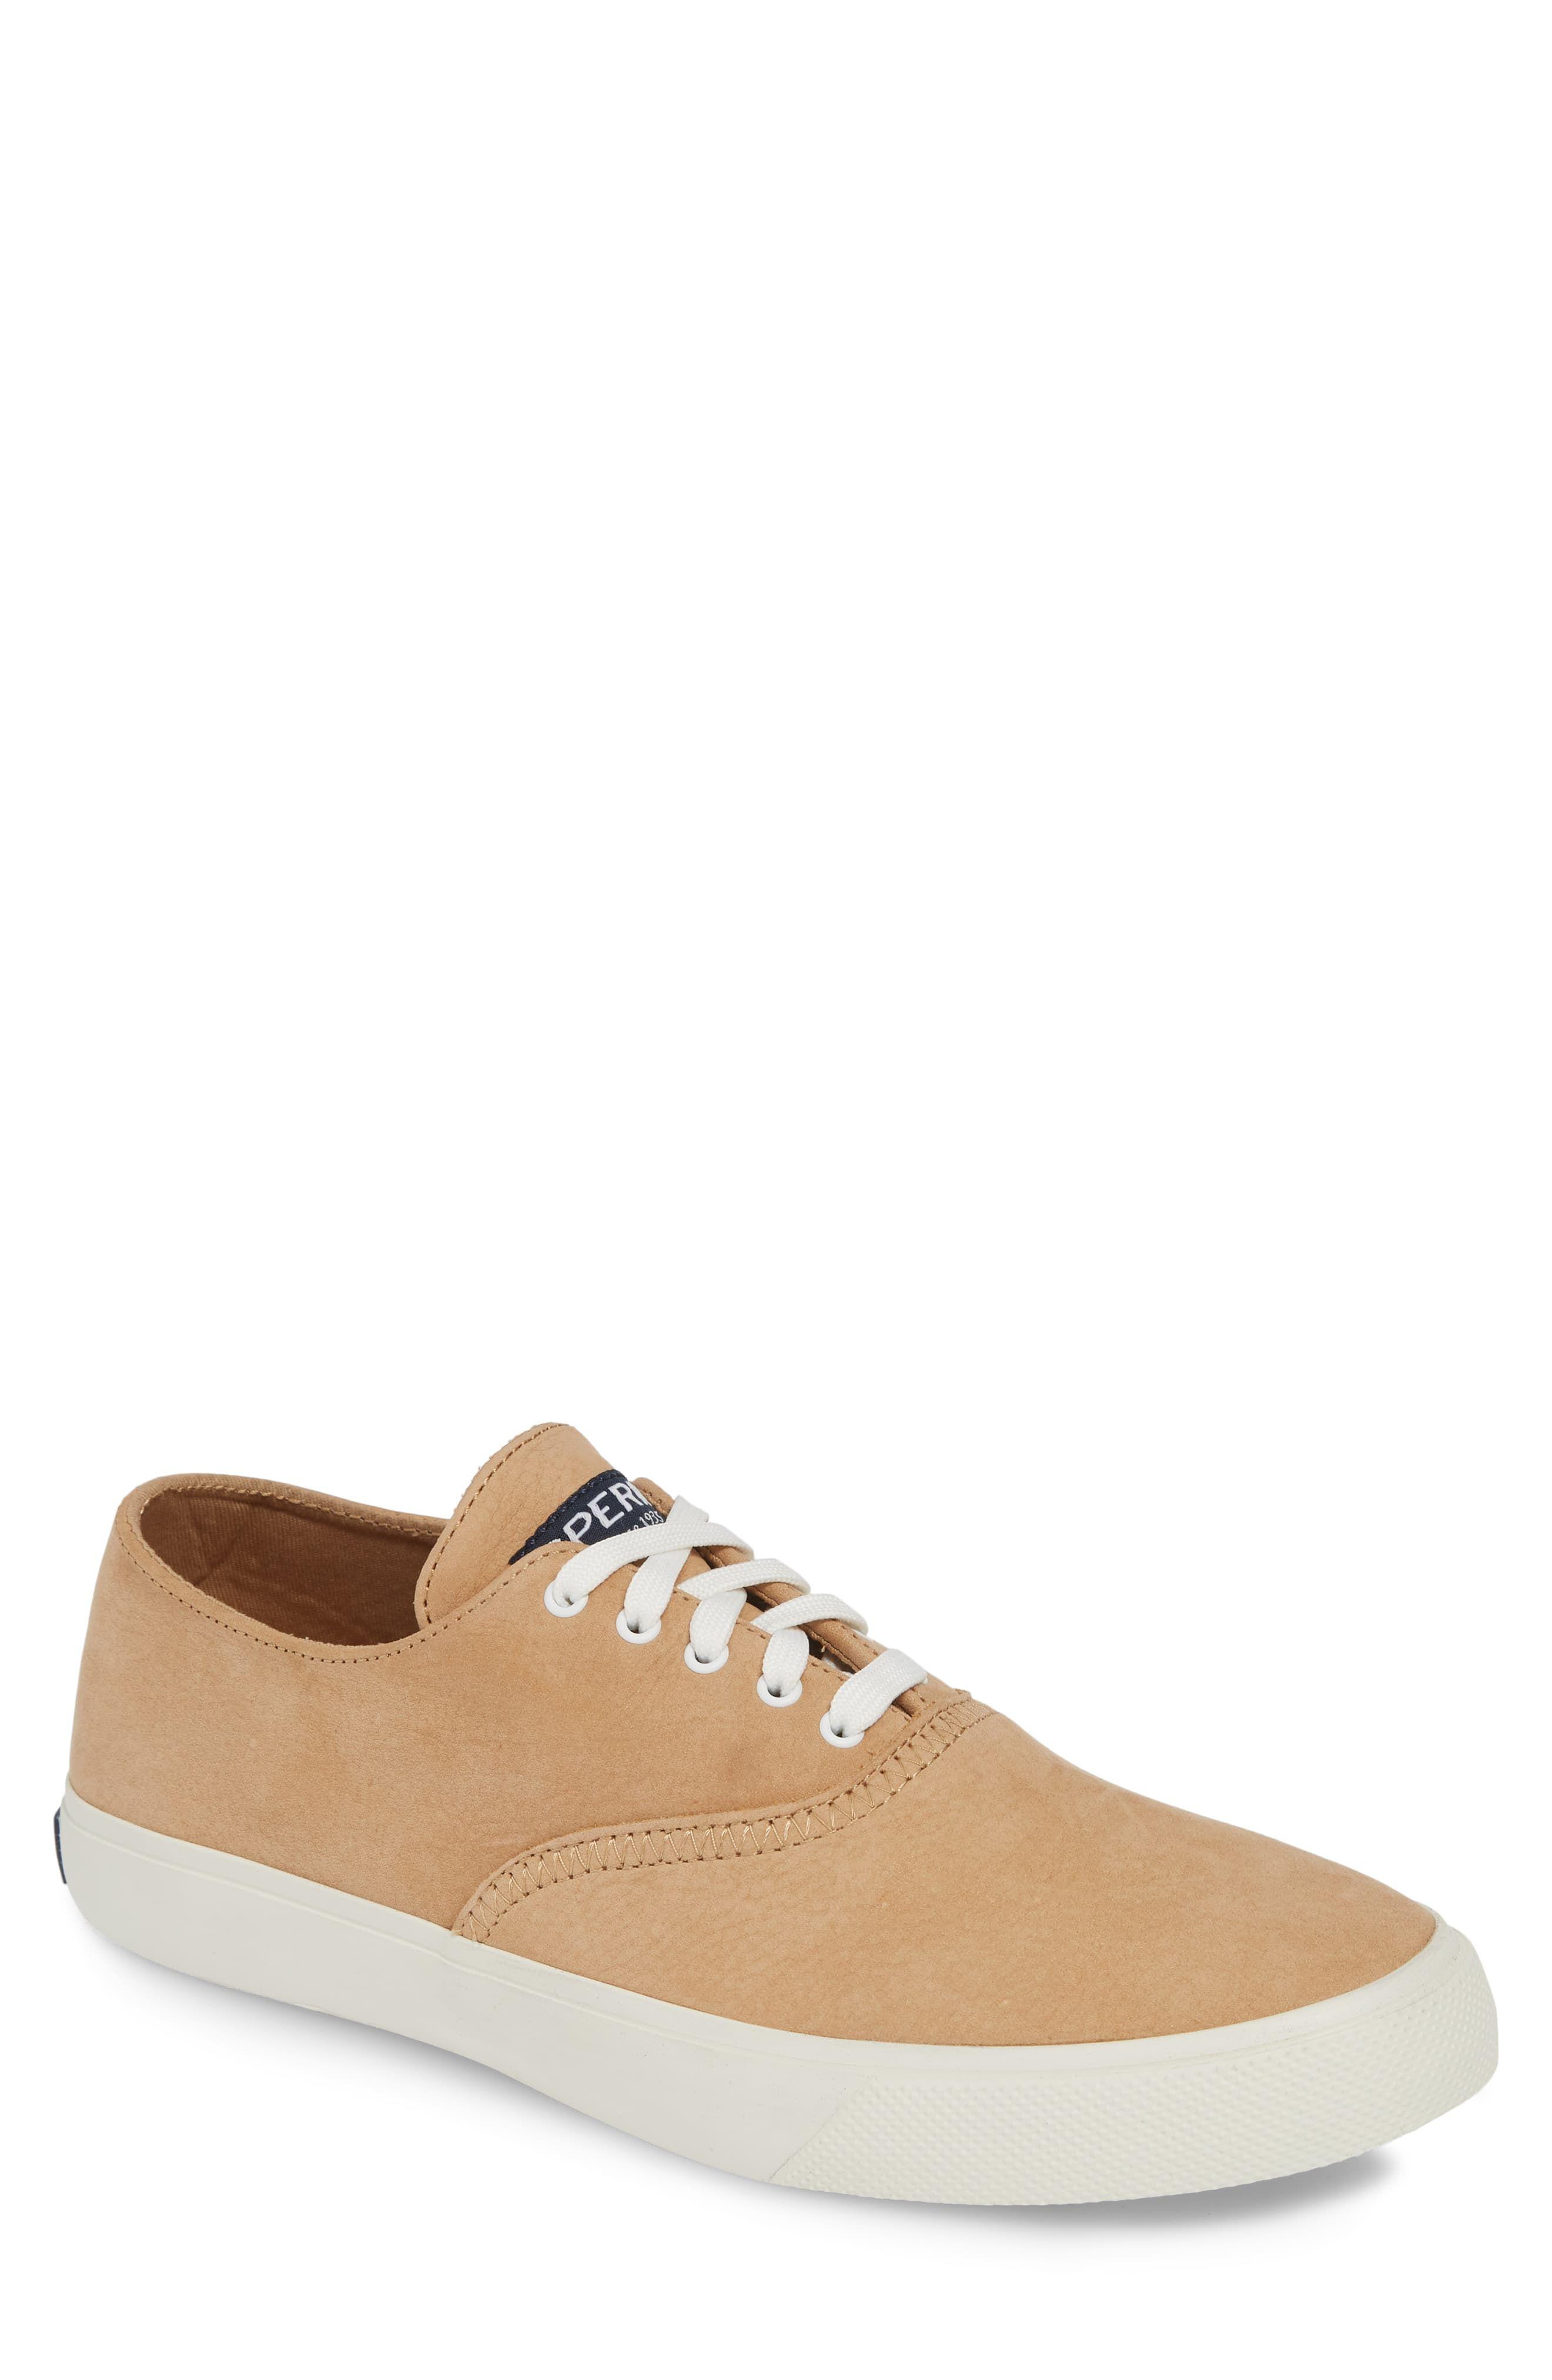 a4fa77c64b35d Men's Sperry Captains Cvo Washable Sneaker, Size 10.5 M - Brown ...